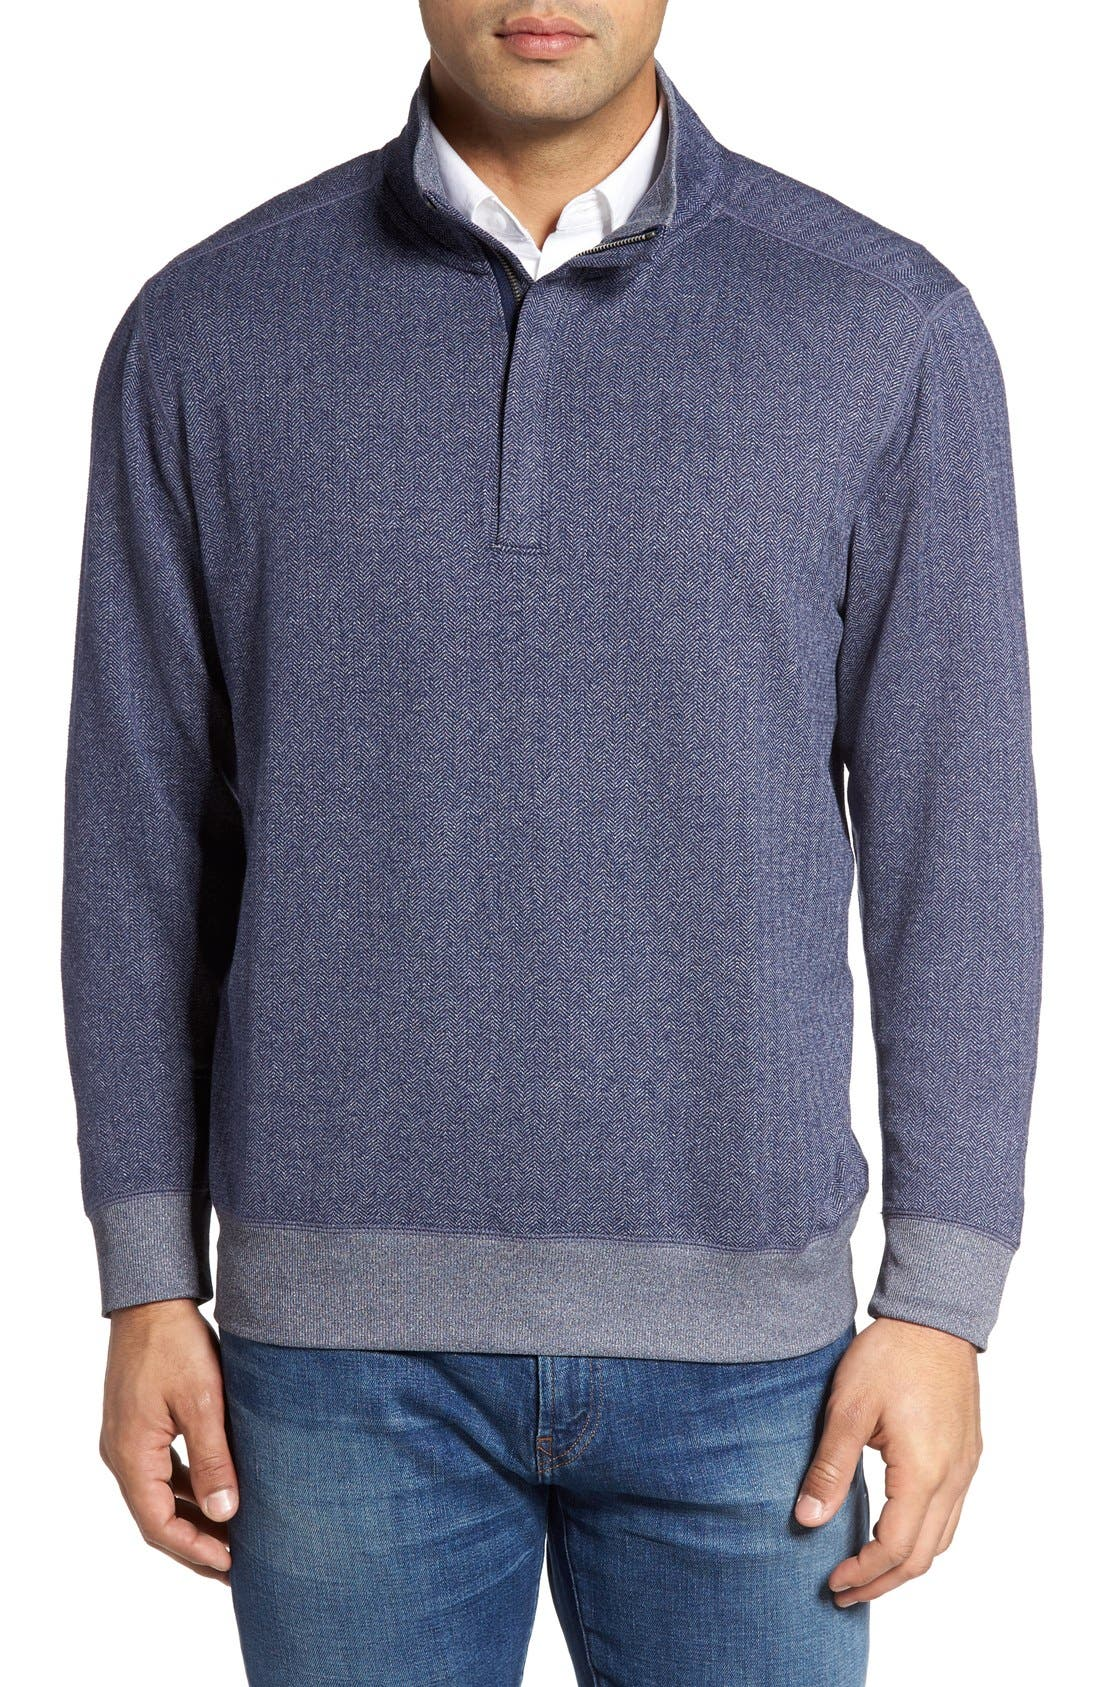 Tommy Bahama Pro Formance Quarter Zip Sweater